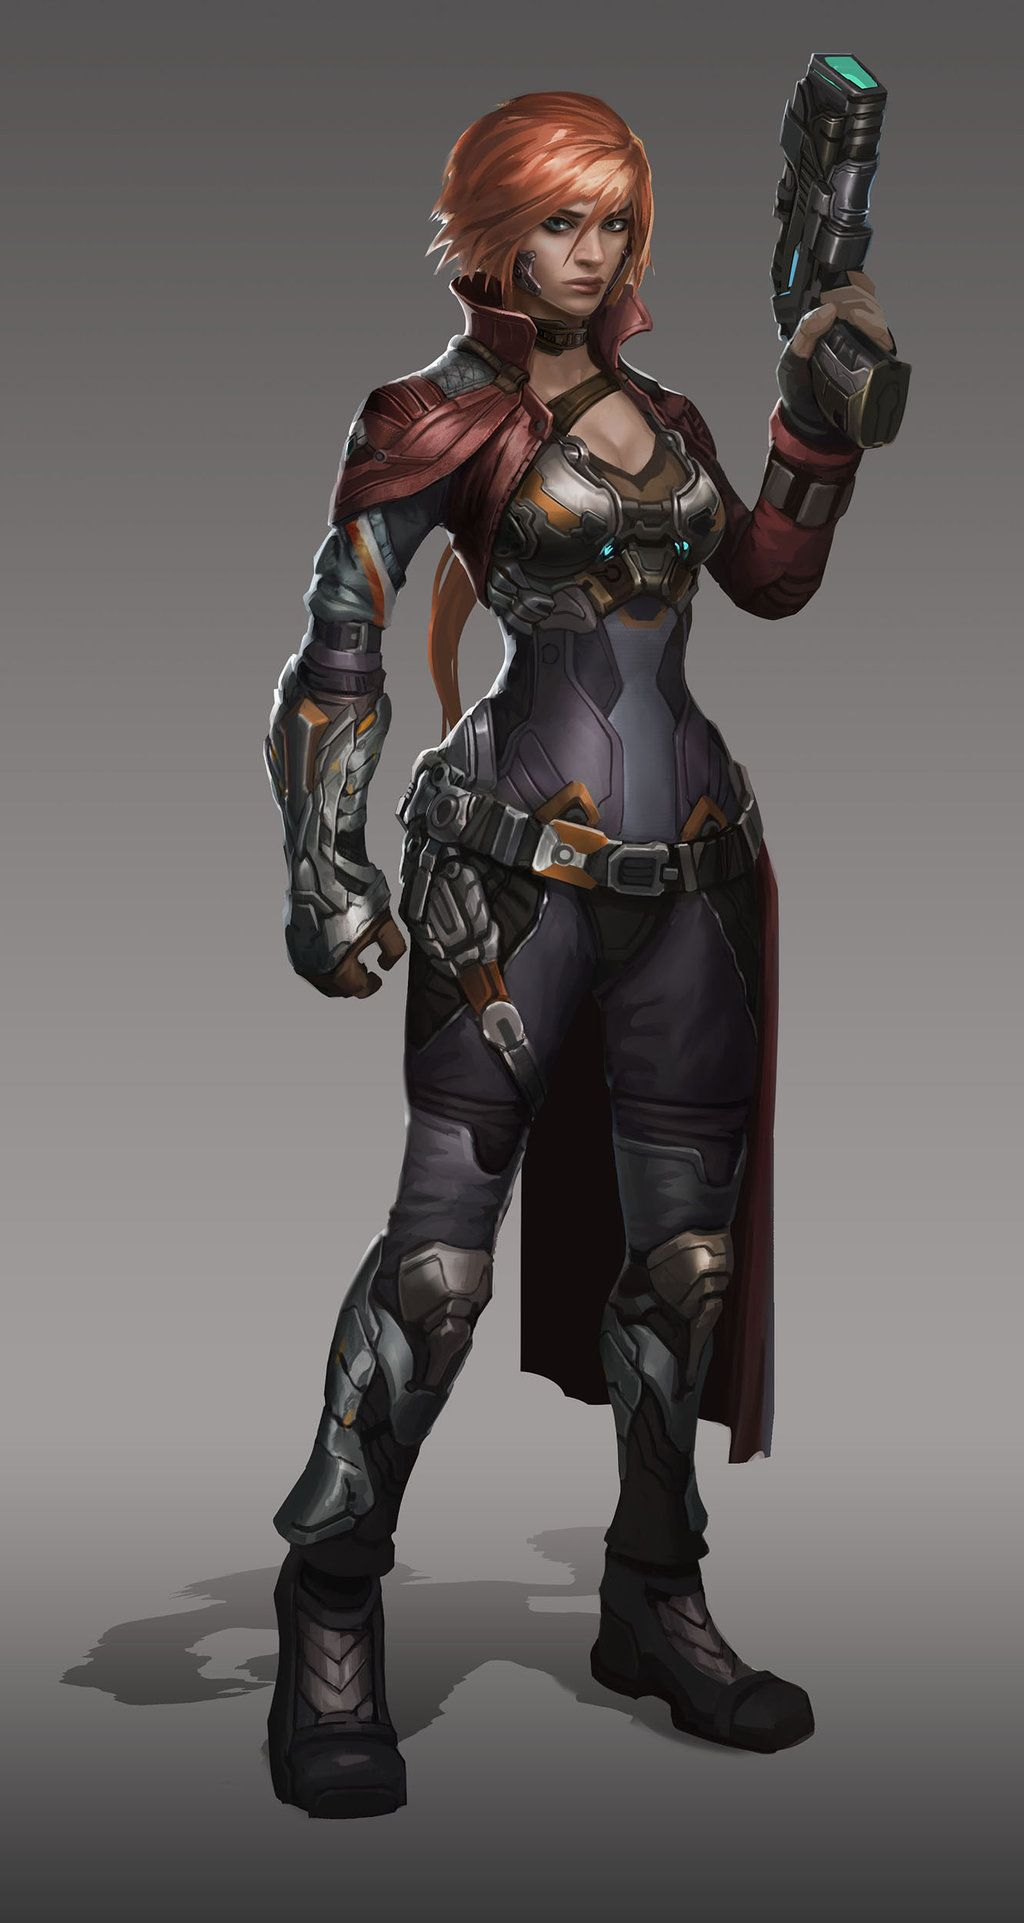 Badass Scifi Gal Cyberpunk Character Sci Fi Characters Sci Fi